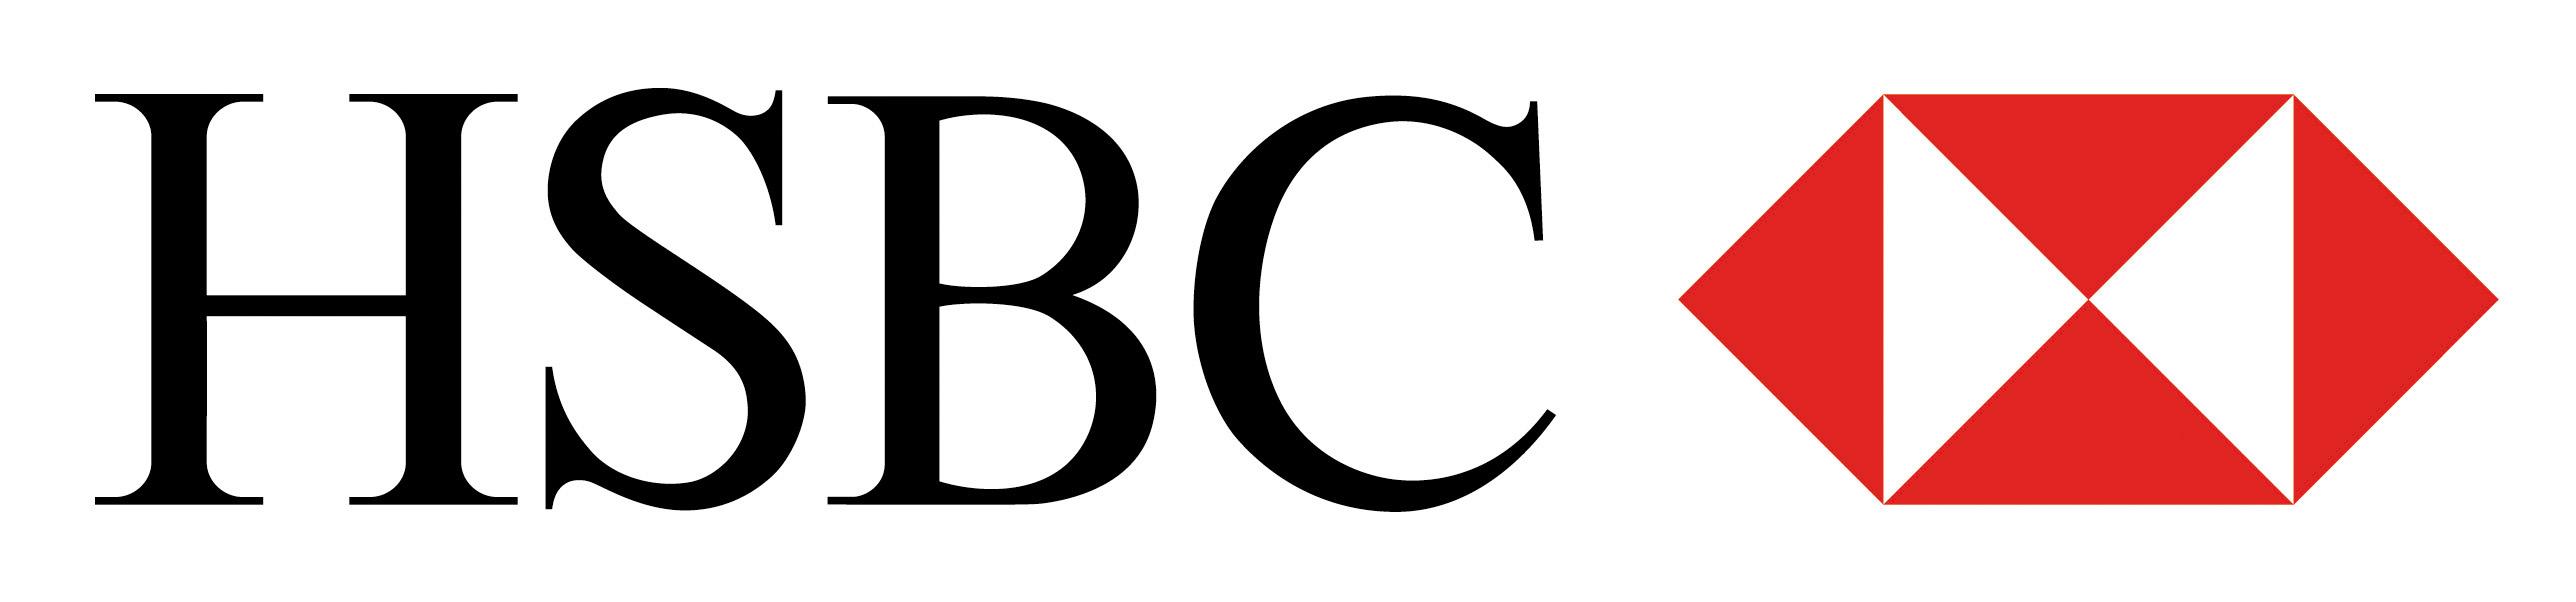 hsbc-holdings-plc-logo